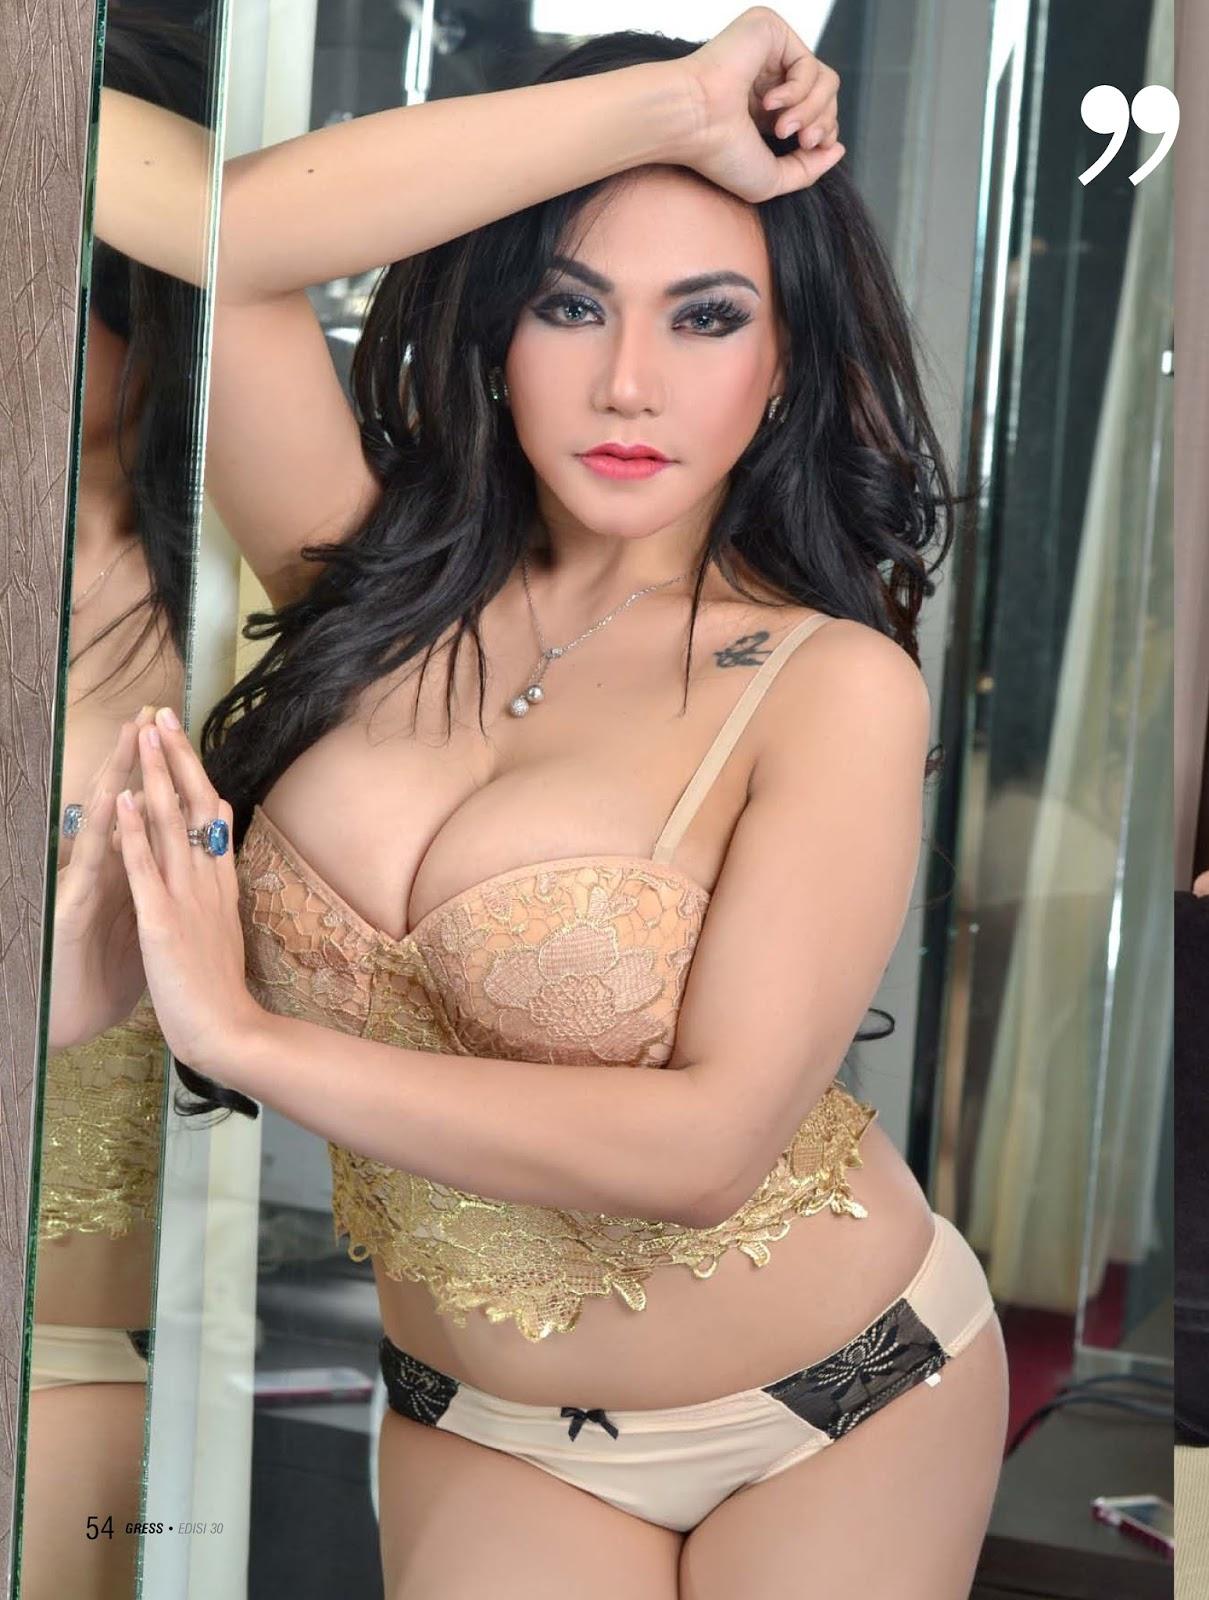 majalah gress n max magazine full foto hot angelica zubir